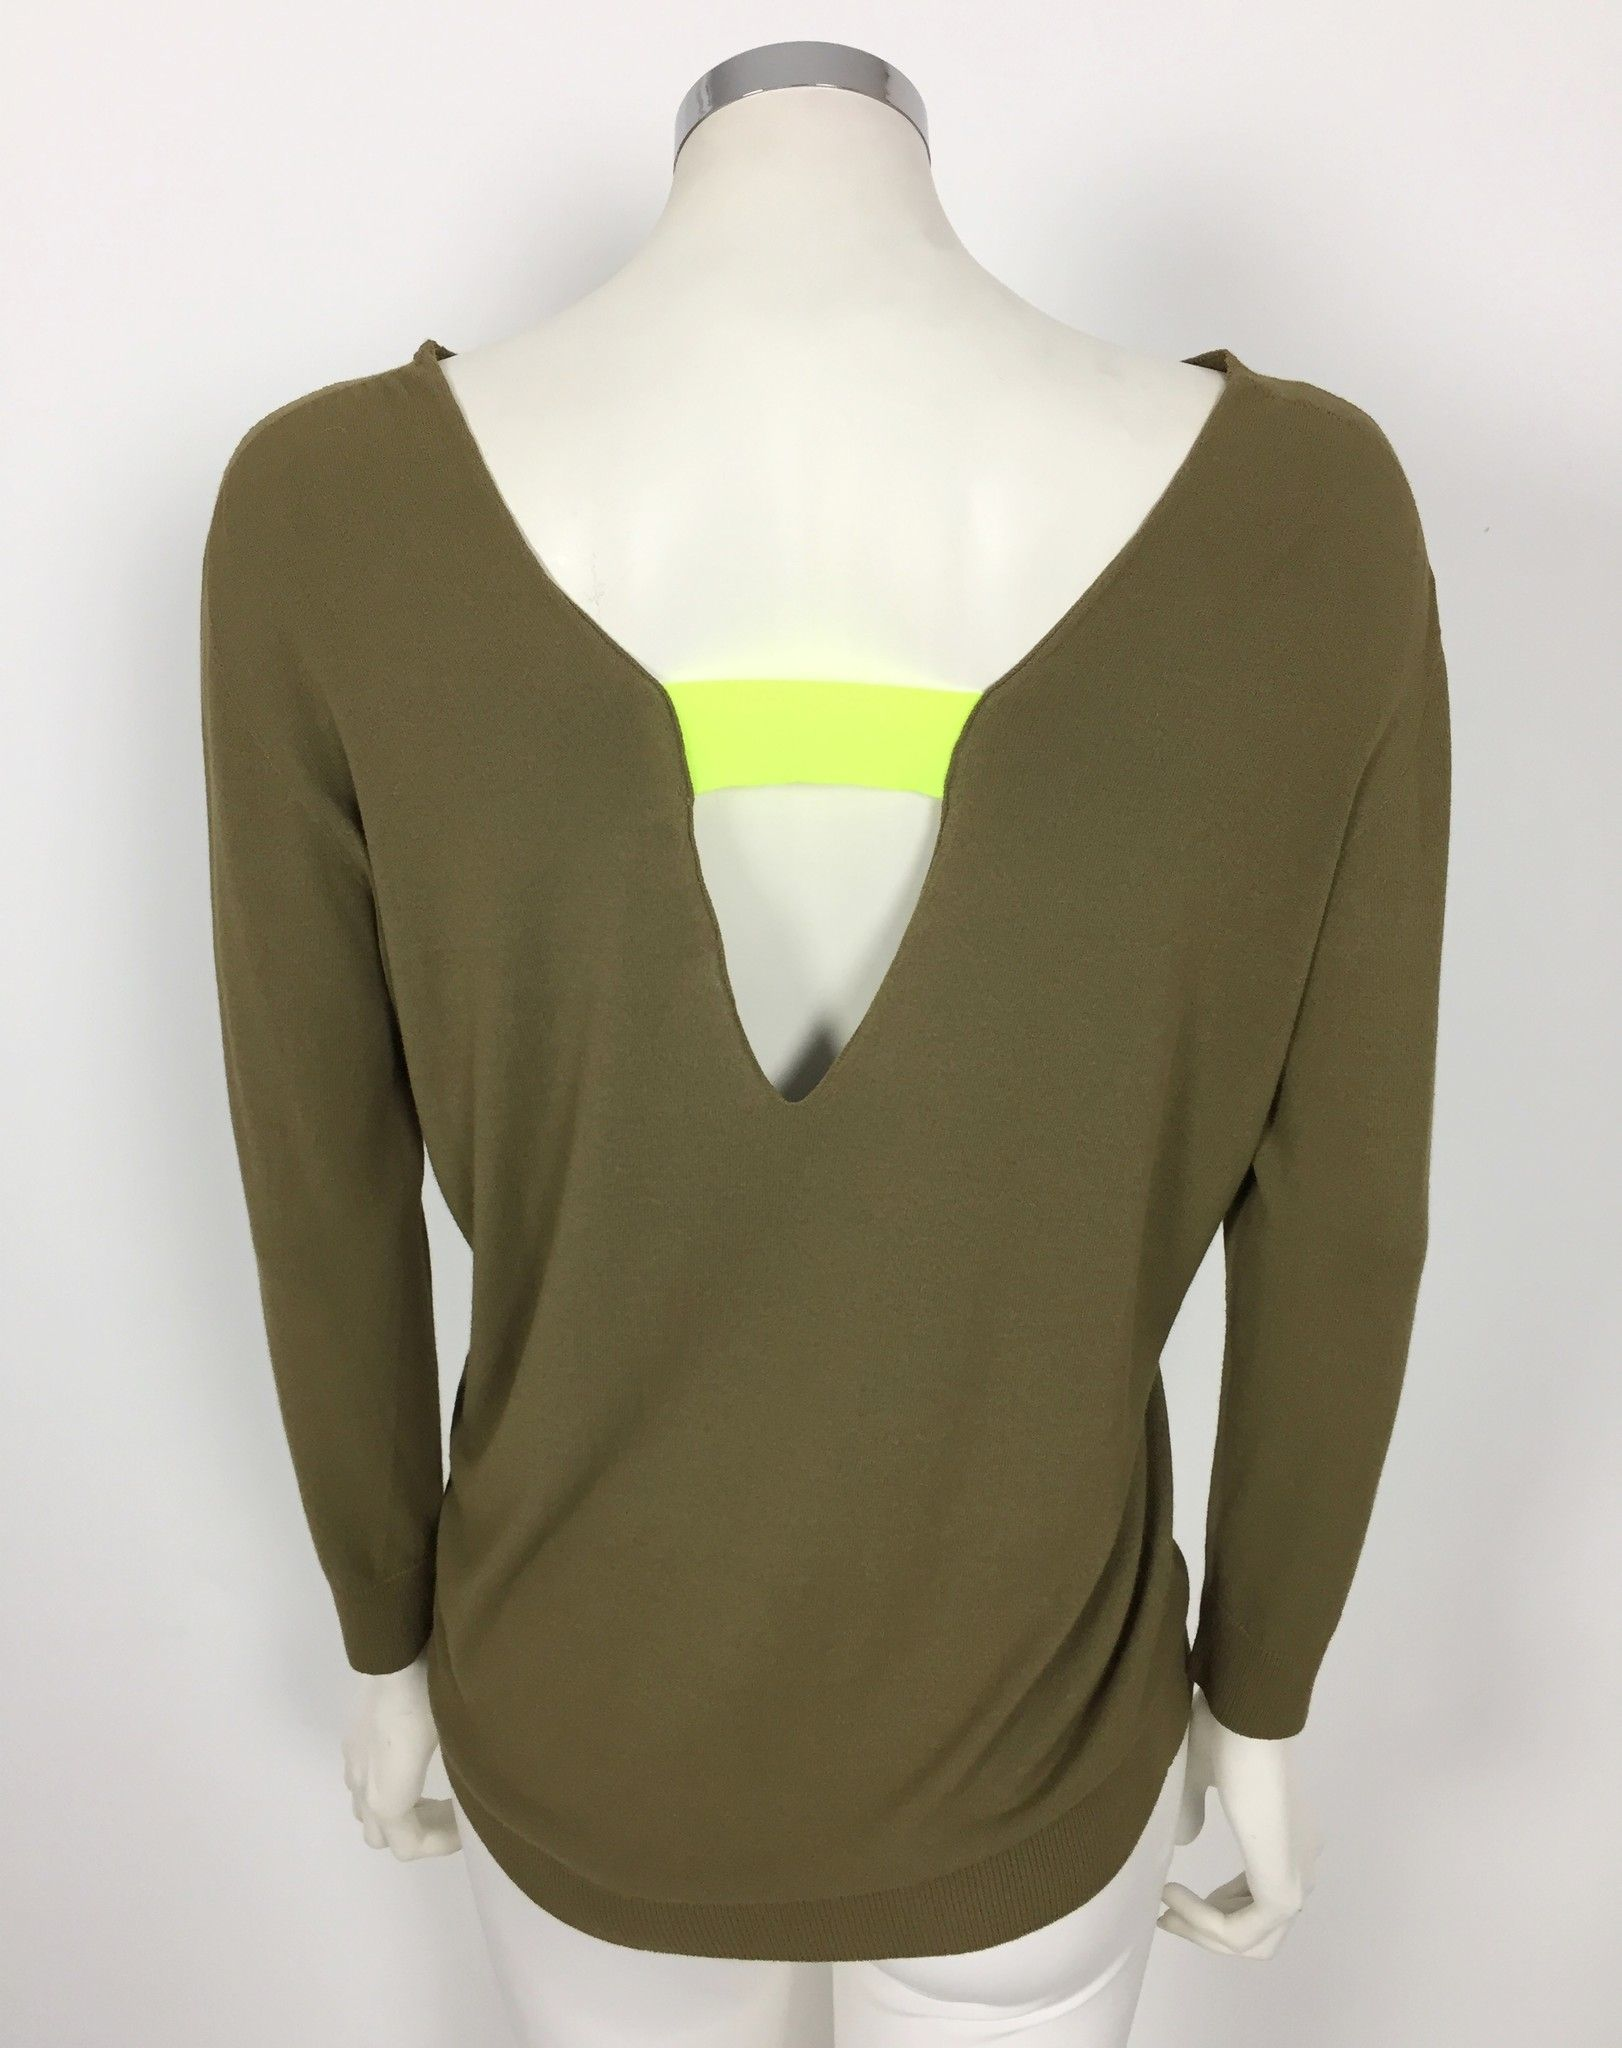 LadyBug Front and Back V-neck Over Sweater Cod.2179